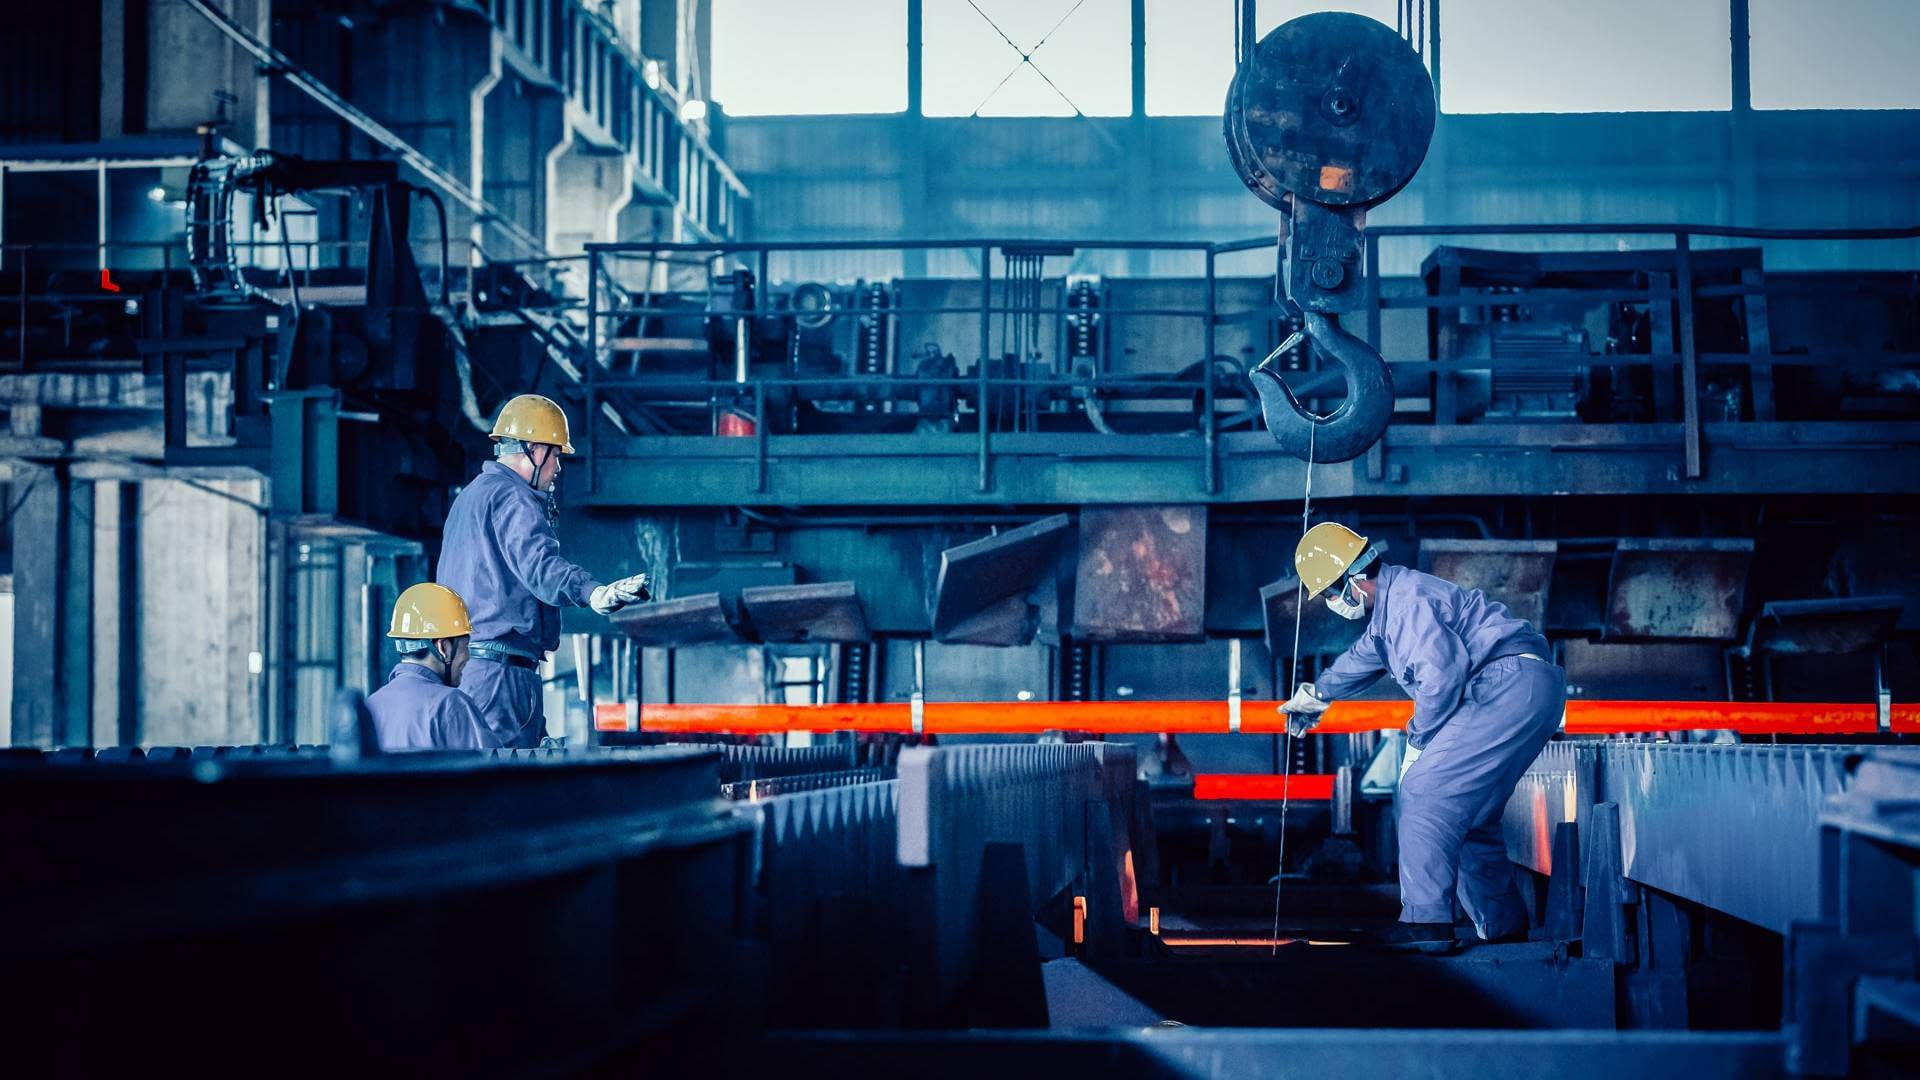 Stahlindustrie RBU